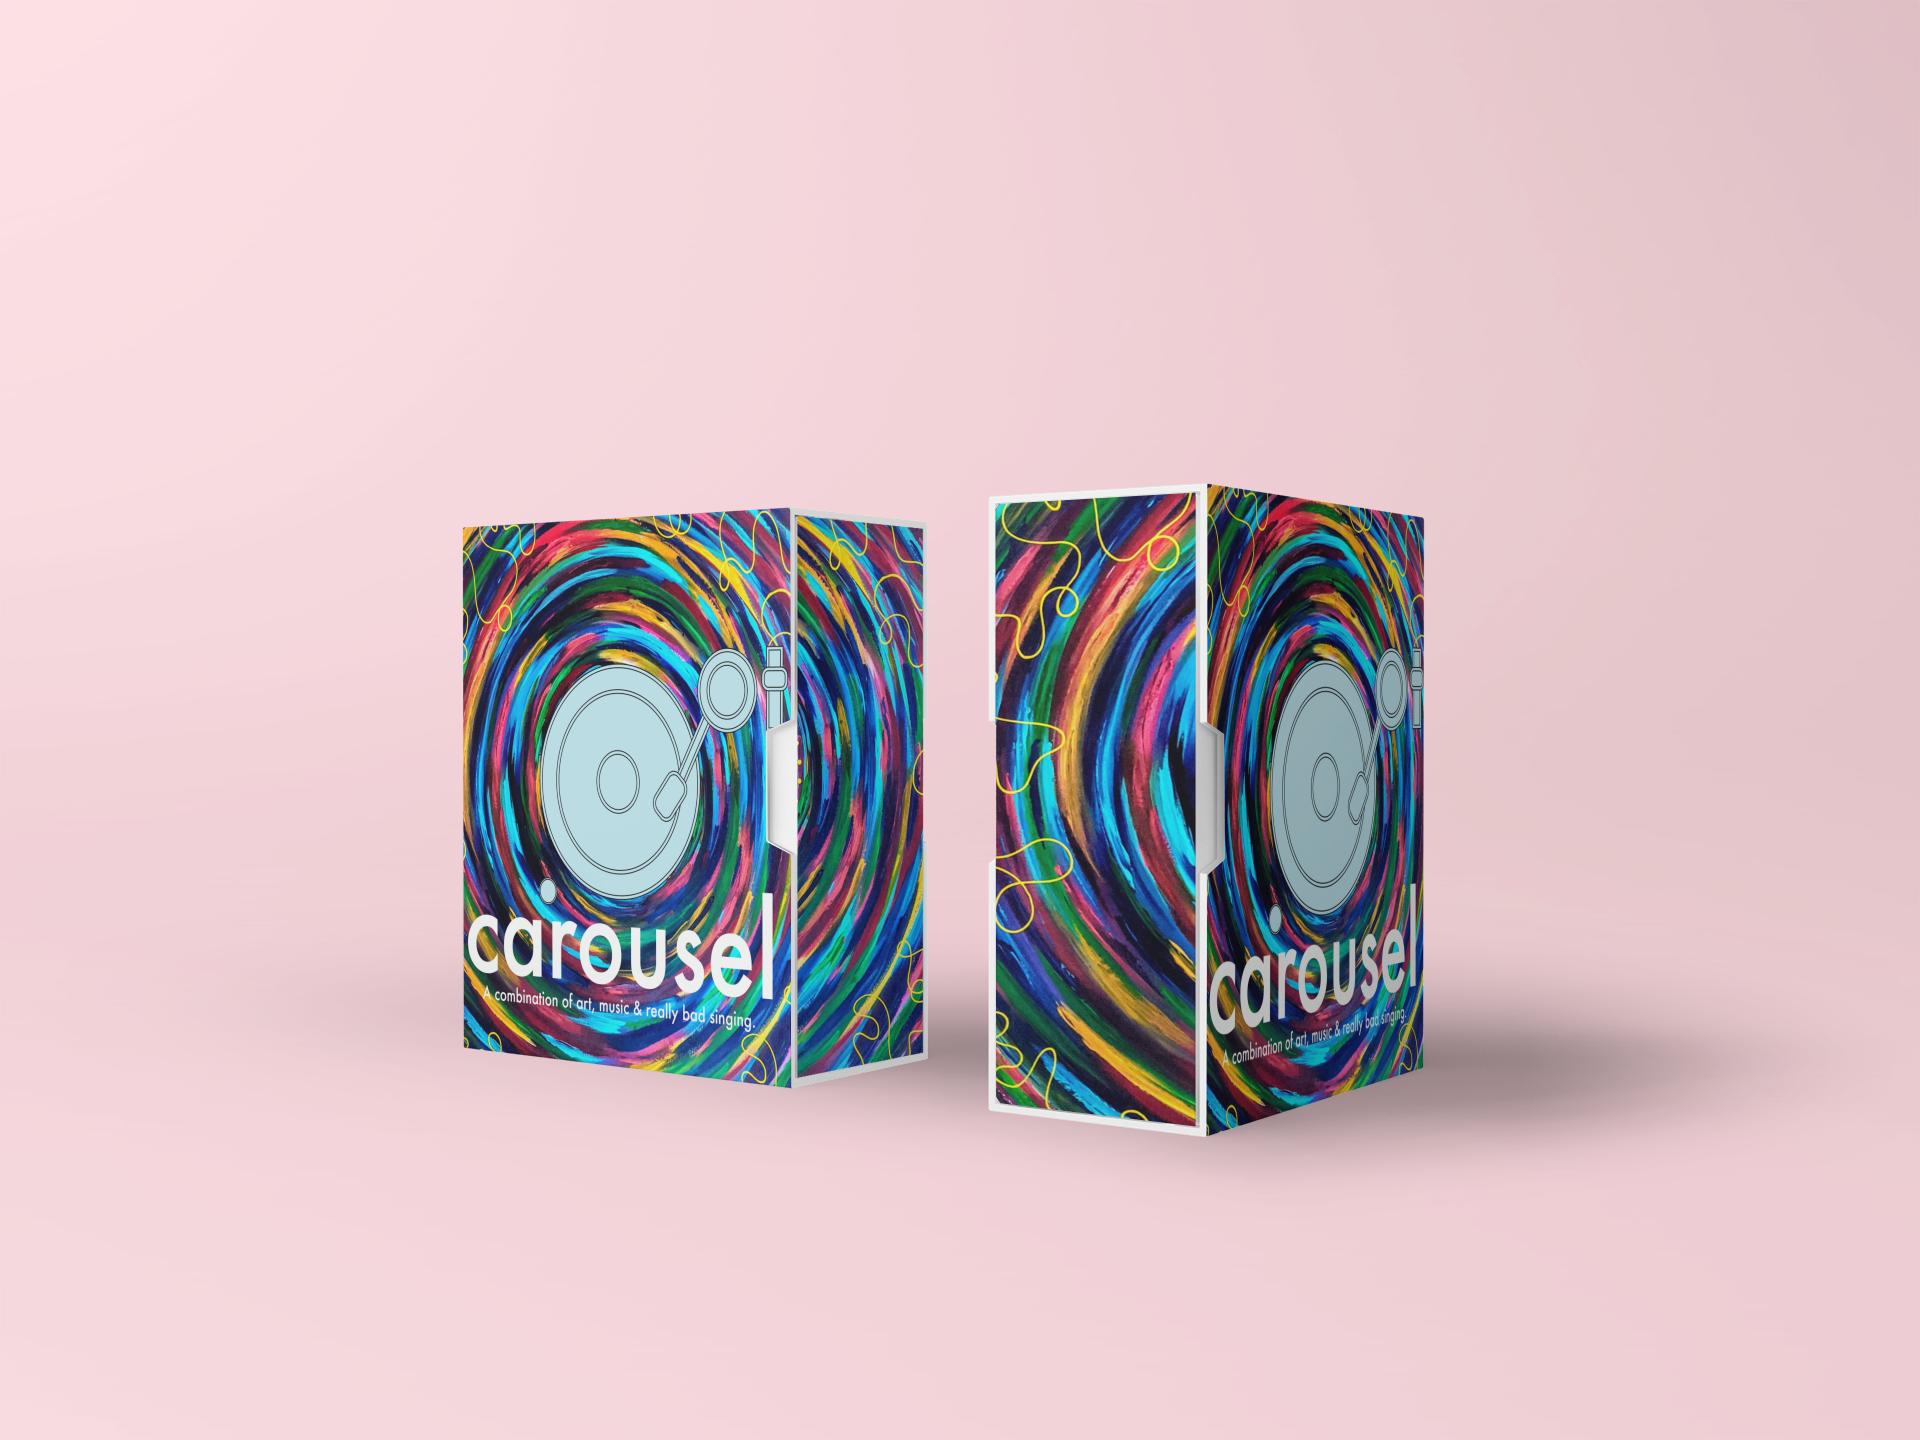 Carousel Game Packaging Design